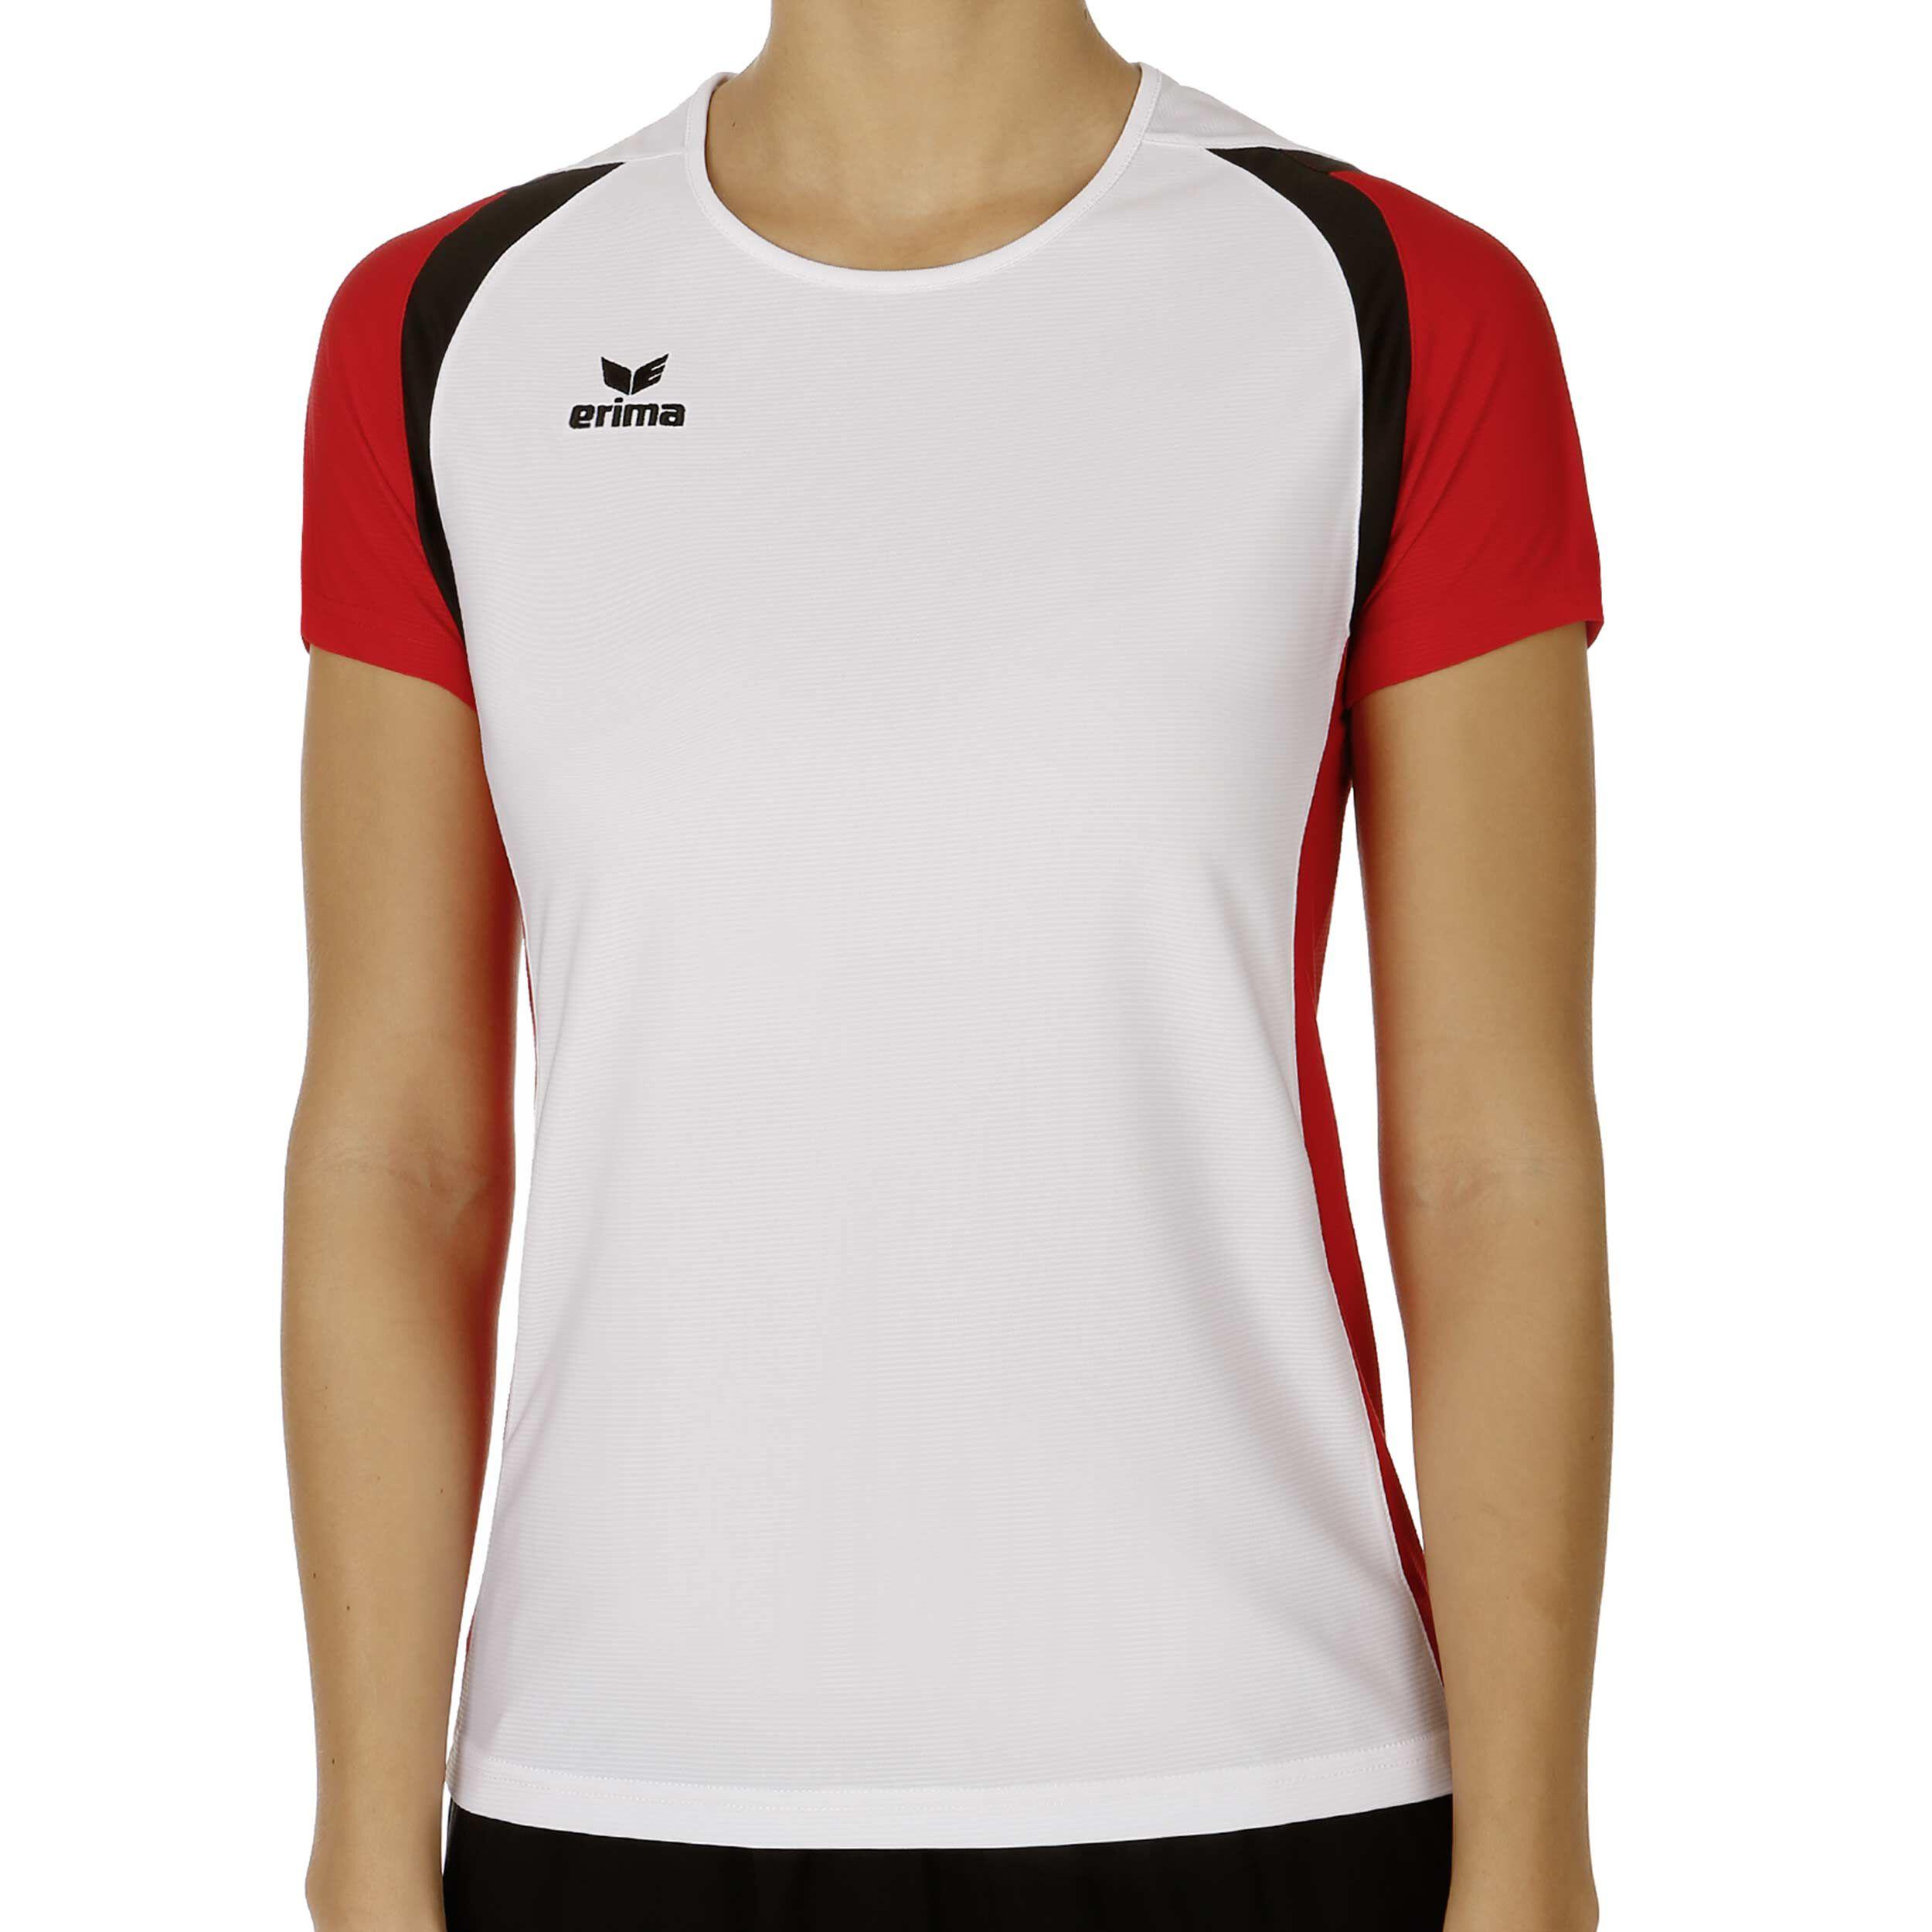 BlancRouge T 2 Razor Shirt 0 Femmes eDHWEY29Ib